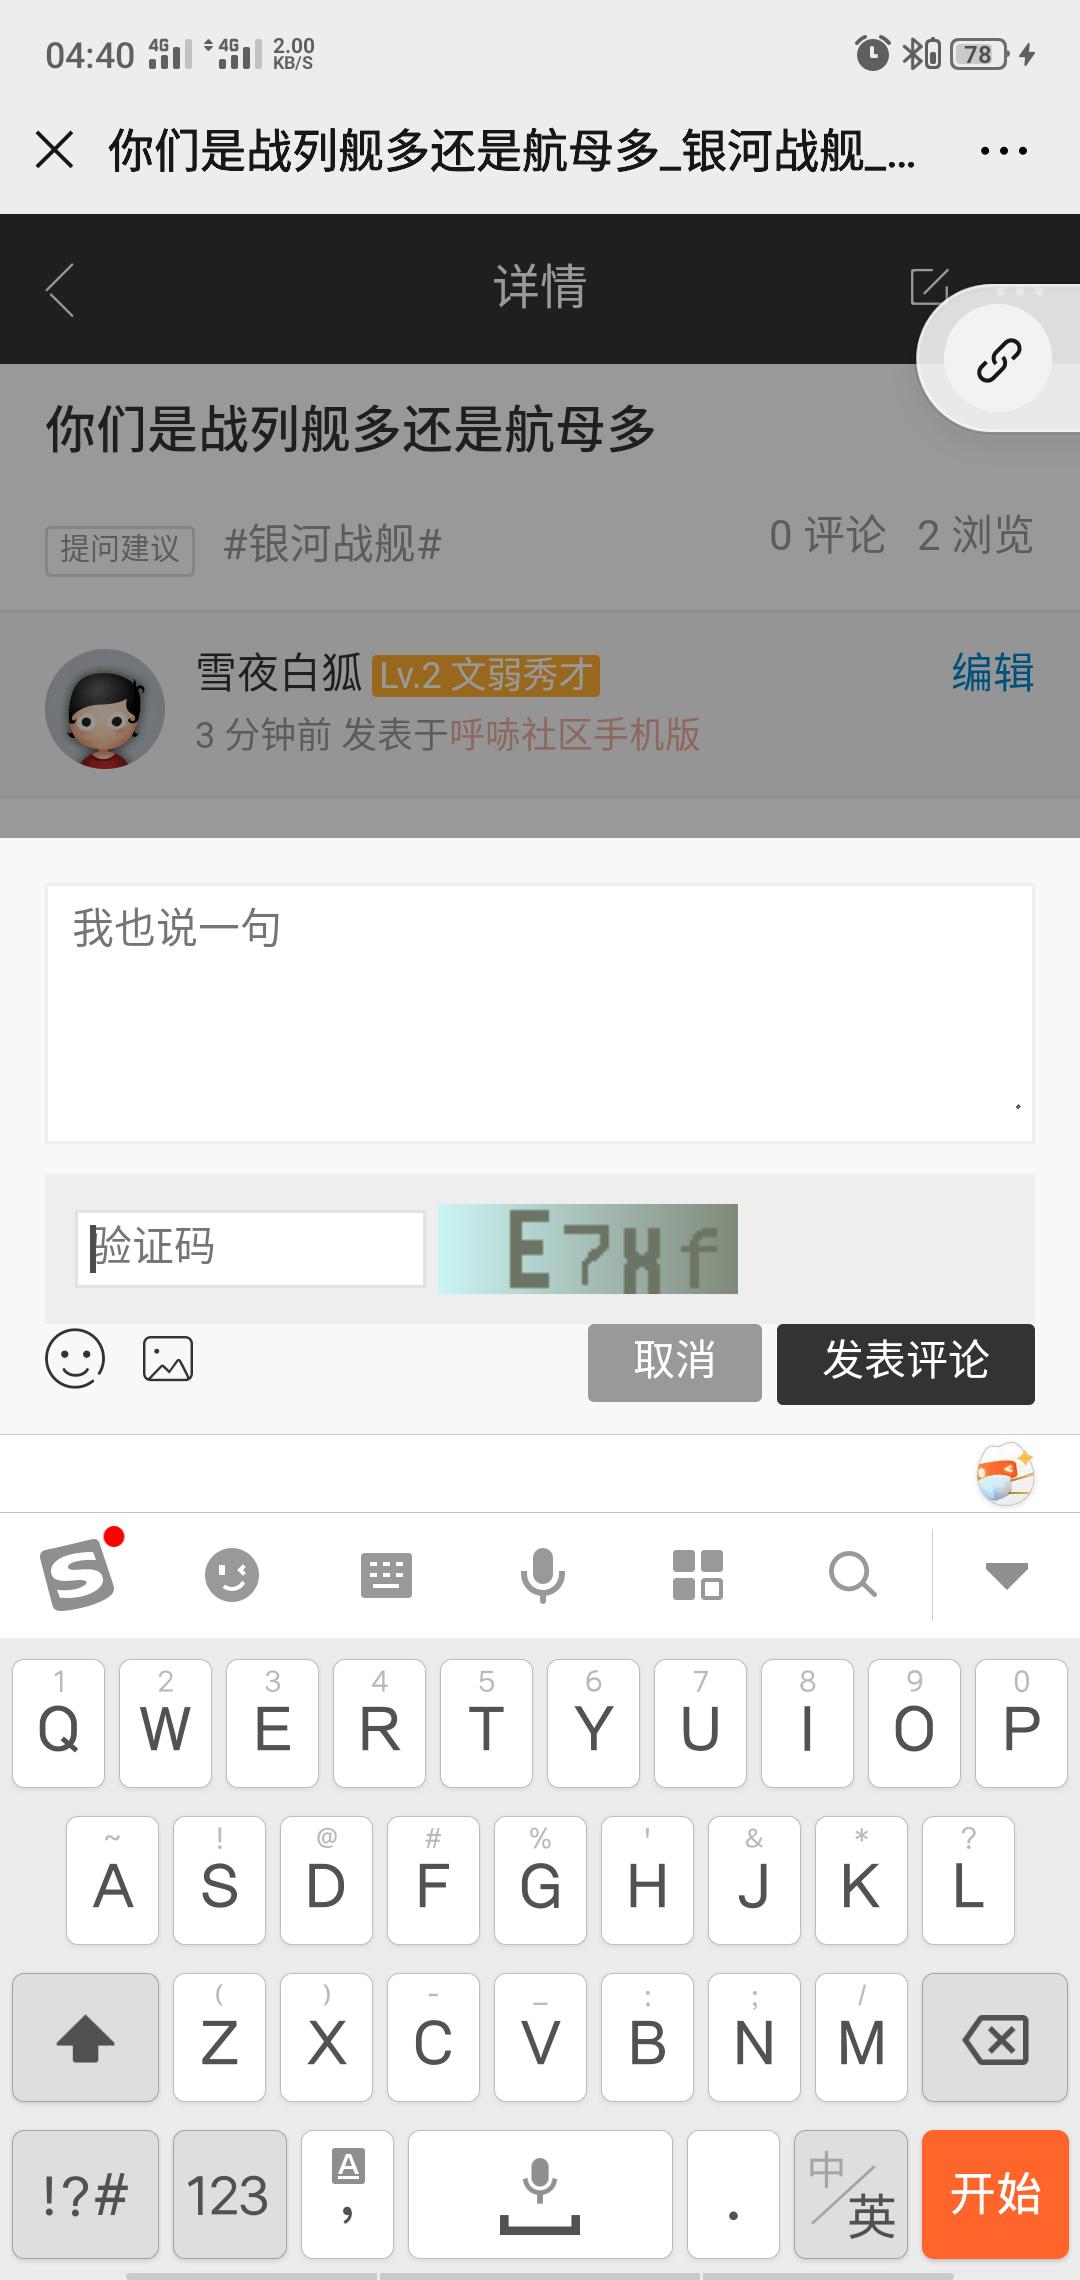 Screenshot_2020-03-18-04-40-37-09.png